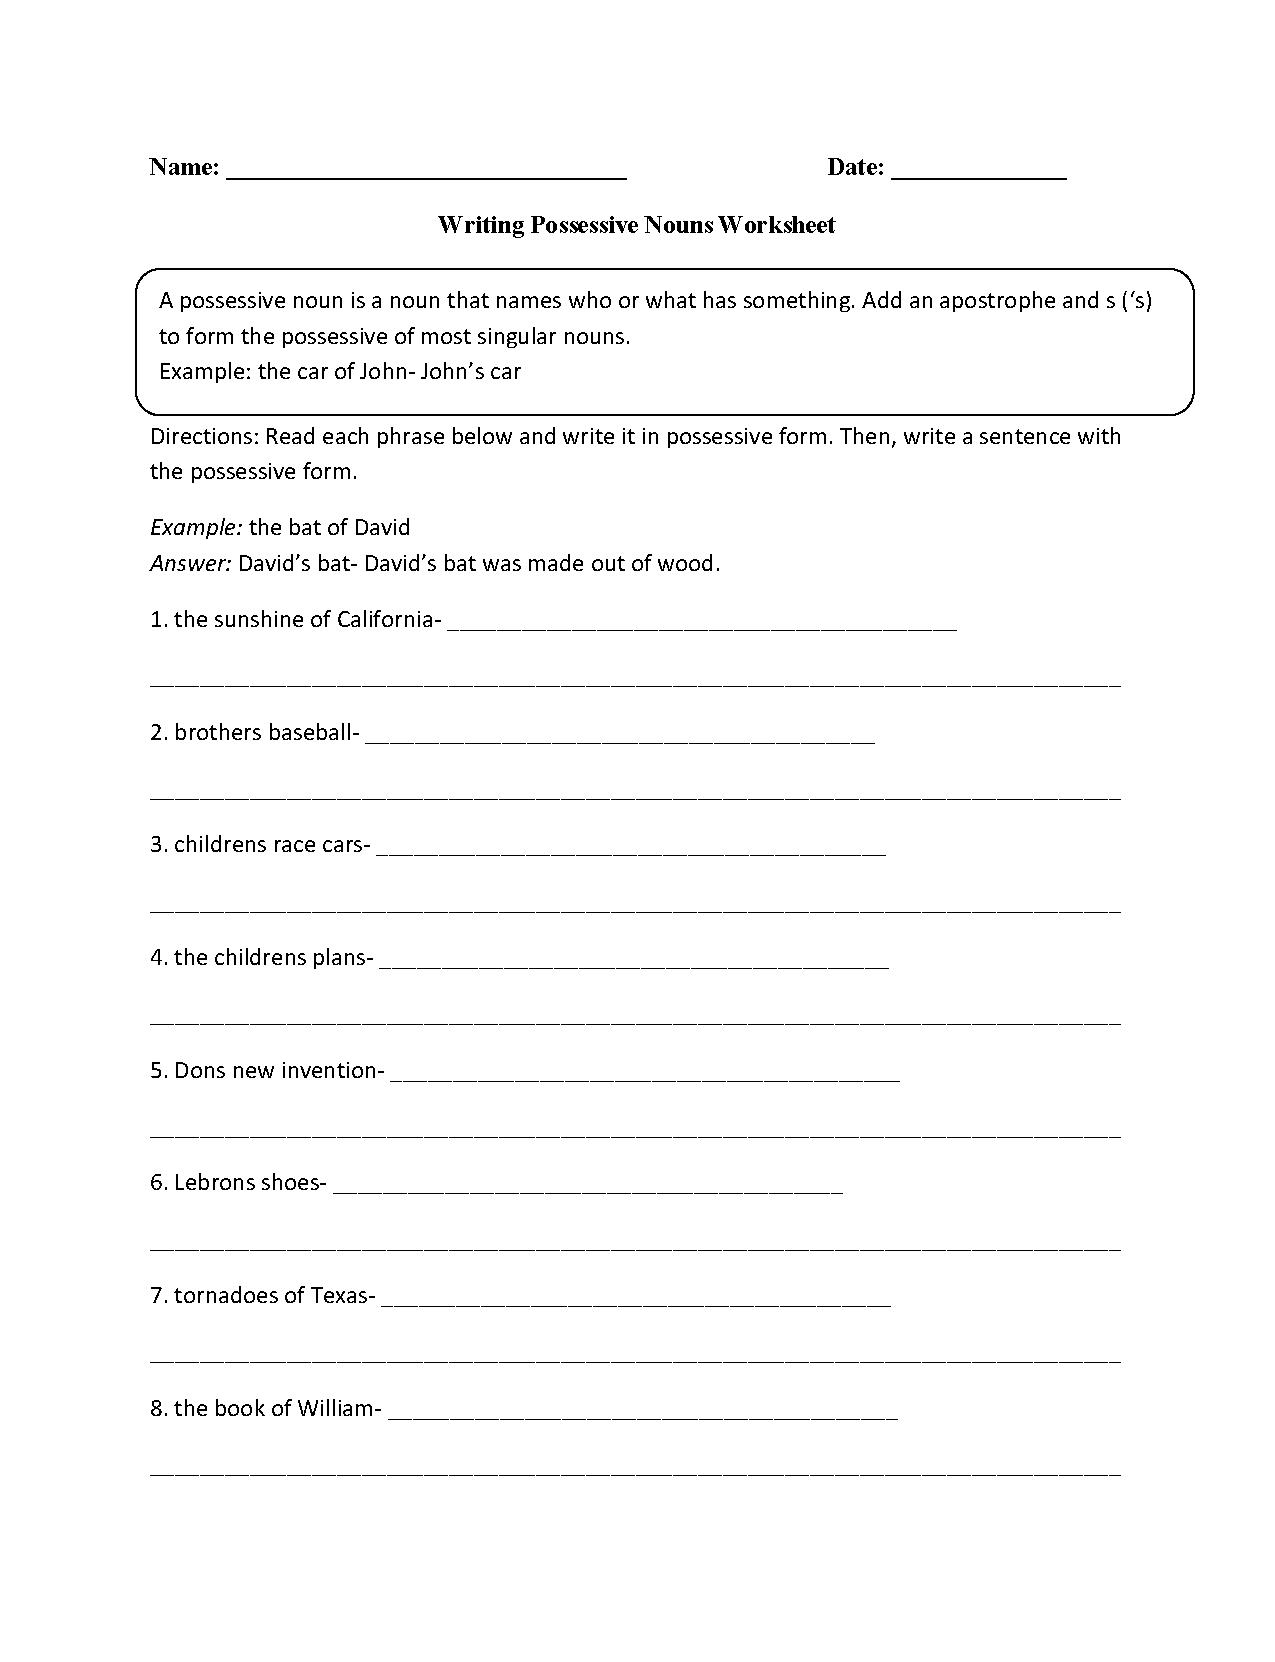 Writing with Possessive Nouns Worksheet   Nouns worksheet [ 1662 x 1275 Pixel ]